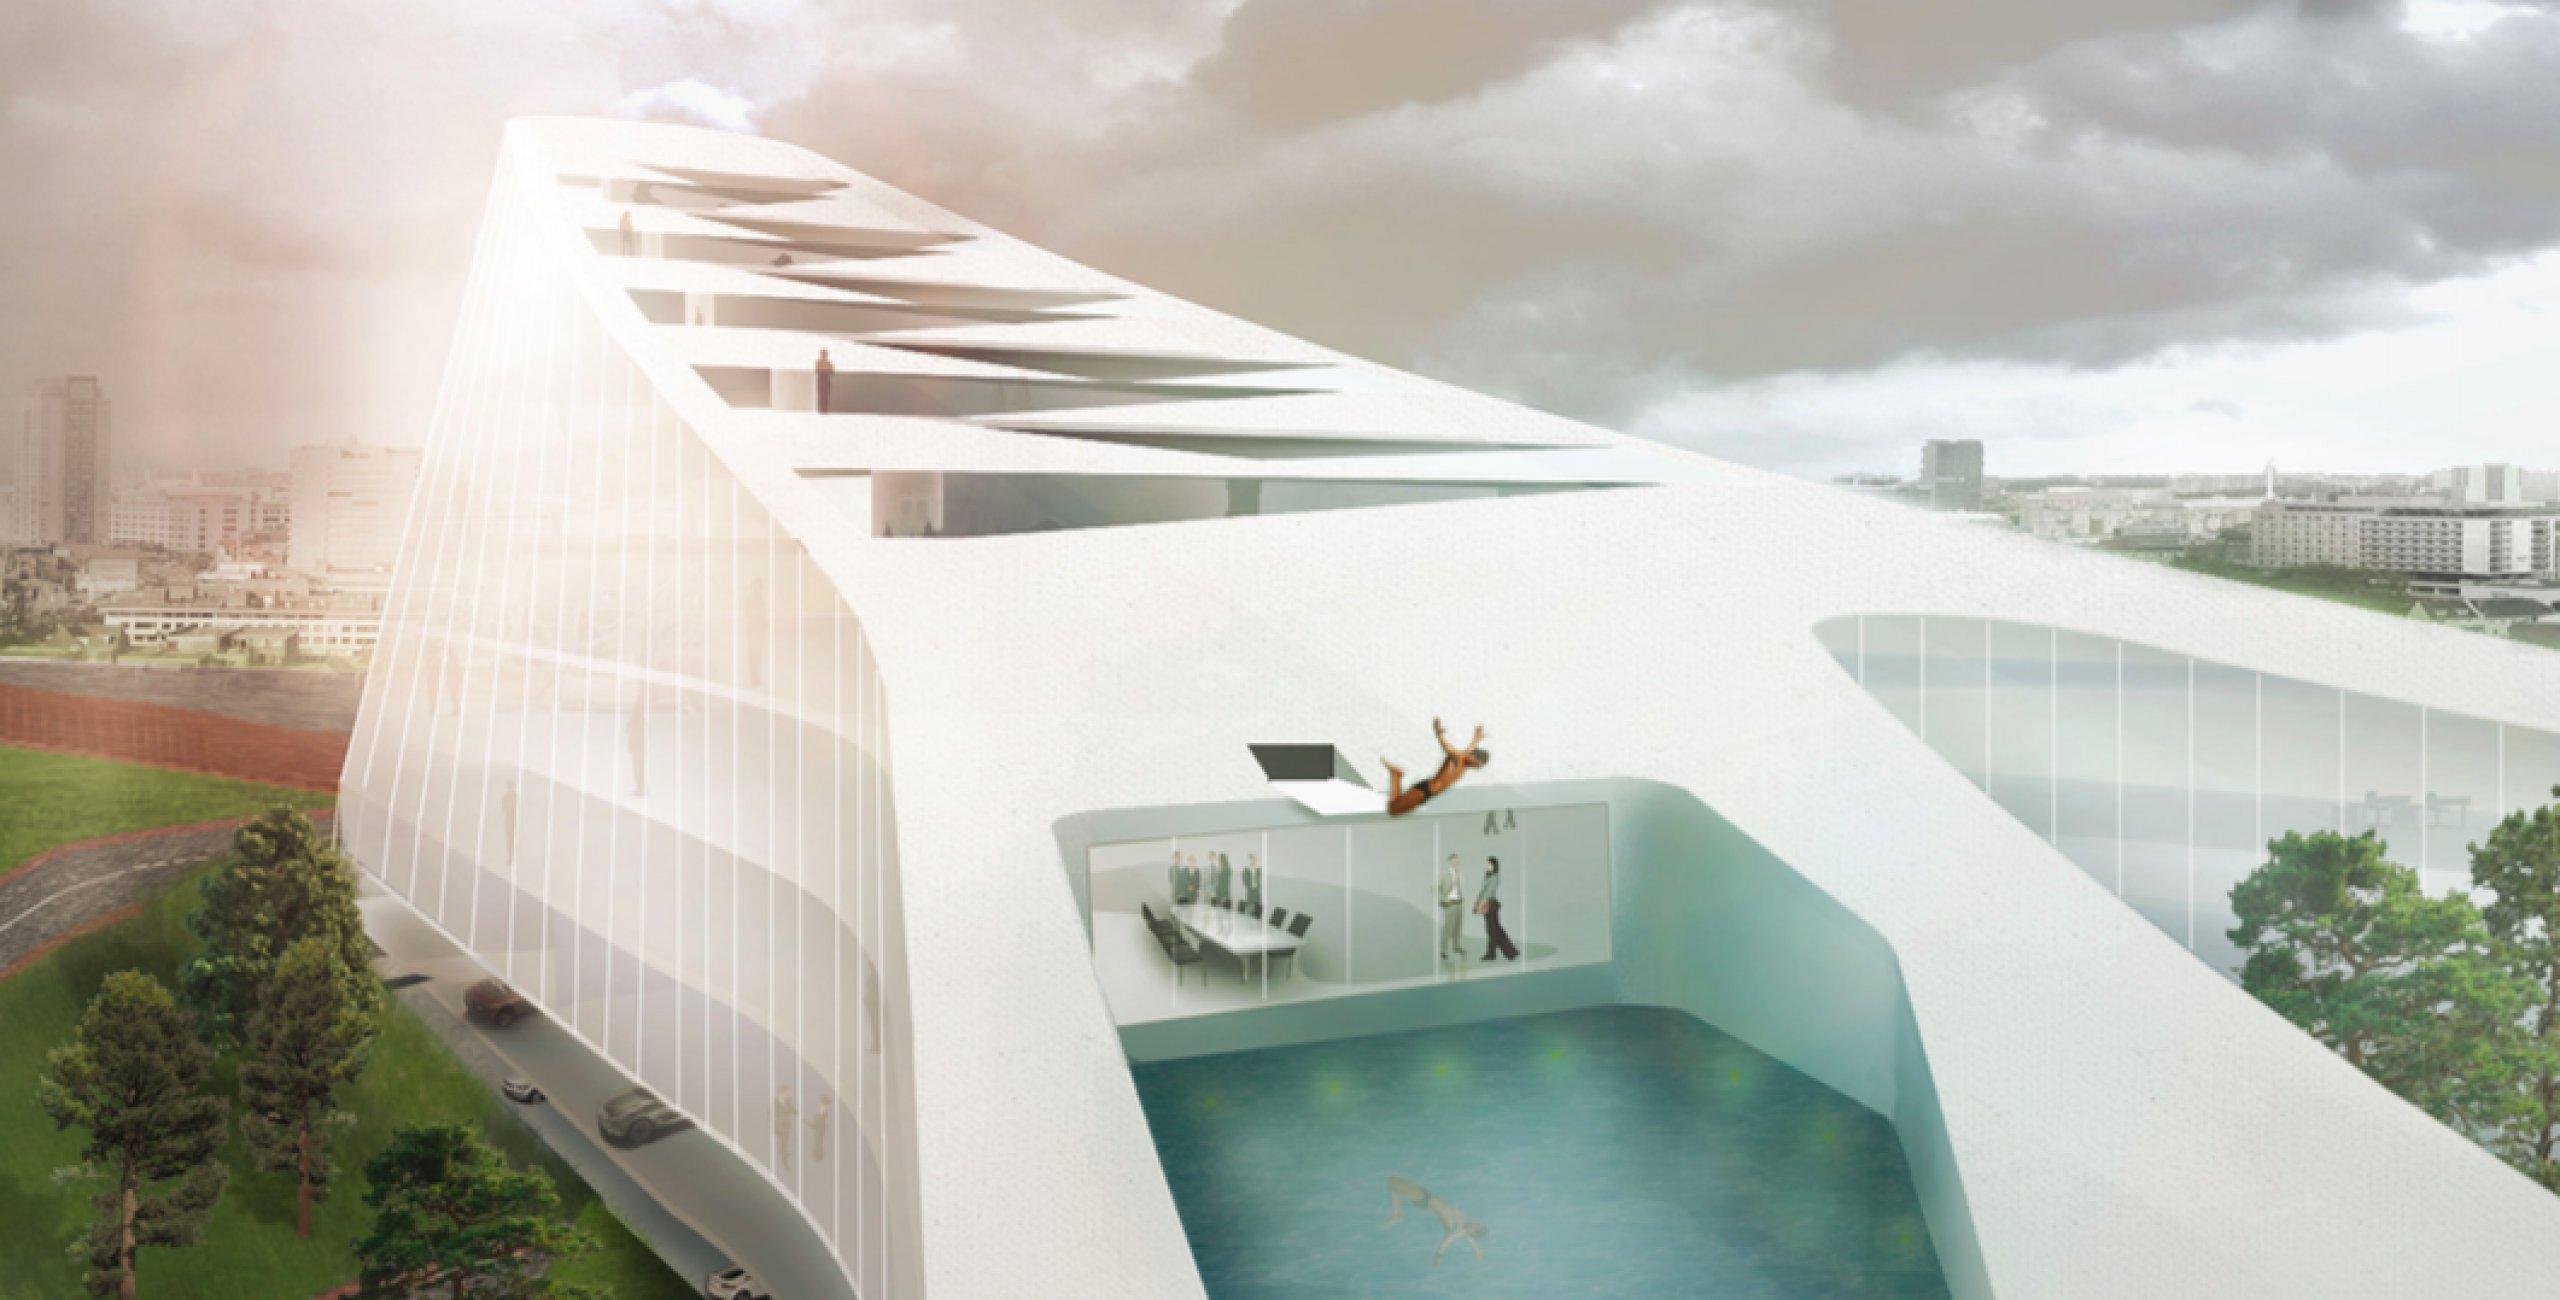 Design: Studio Marco Vermeulen